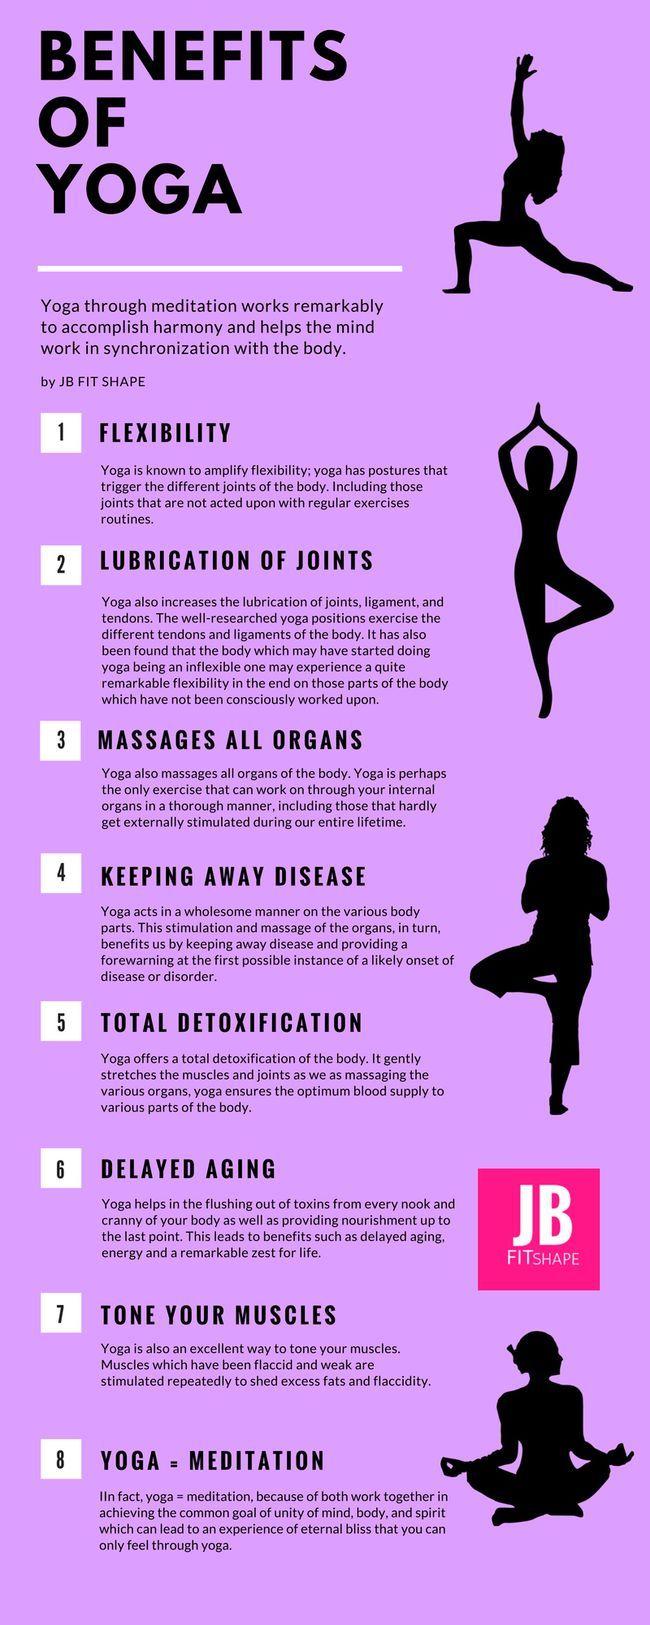 10 Health Benefits of Yoga